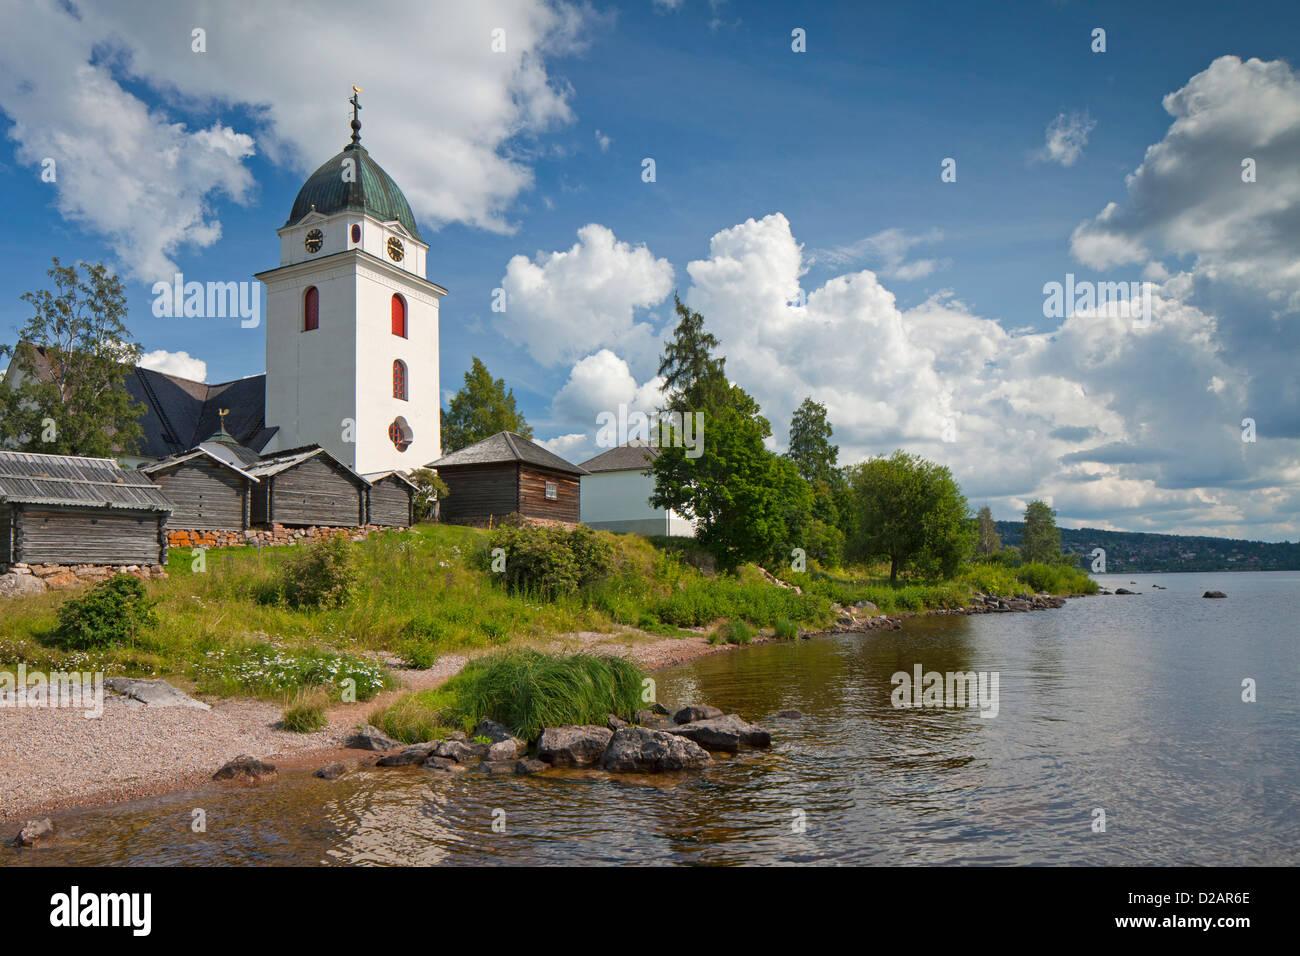 Rättvik Church on the shore of lake Siljan, Dalarna, Sweden, Scandinavia - Stock Image